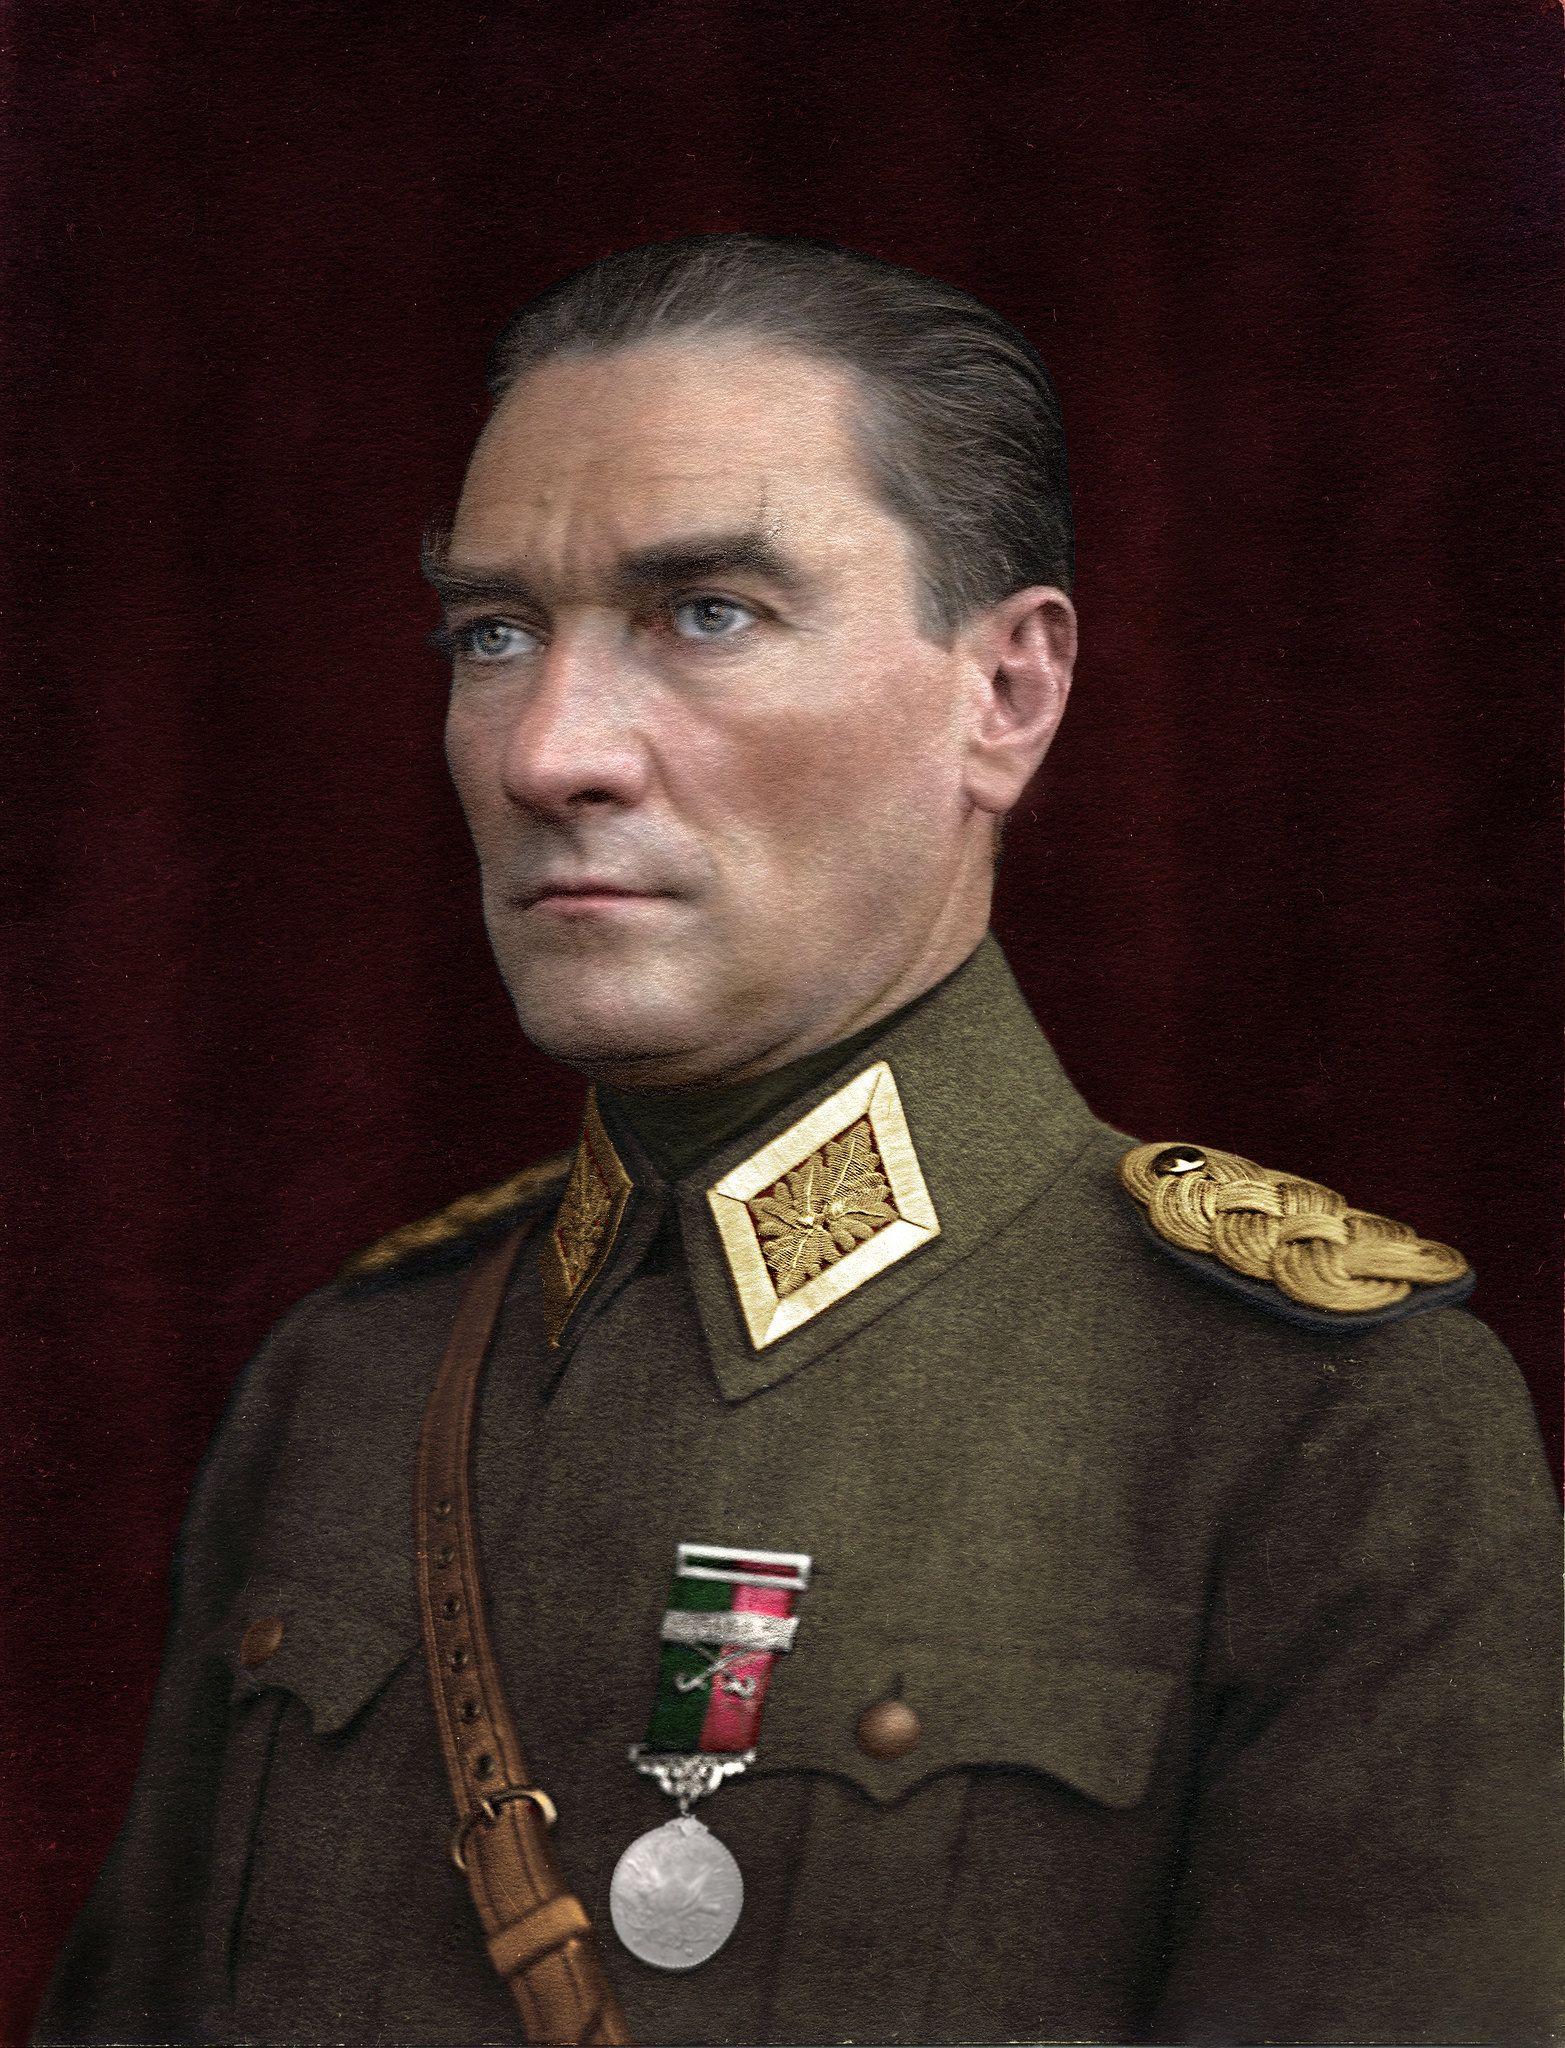 Mustafa Kemal Ataturk Colorized Historical Photos War Photography Old Photography